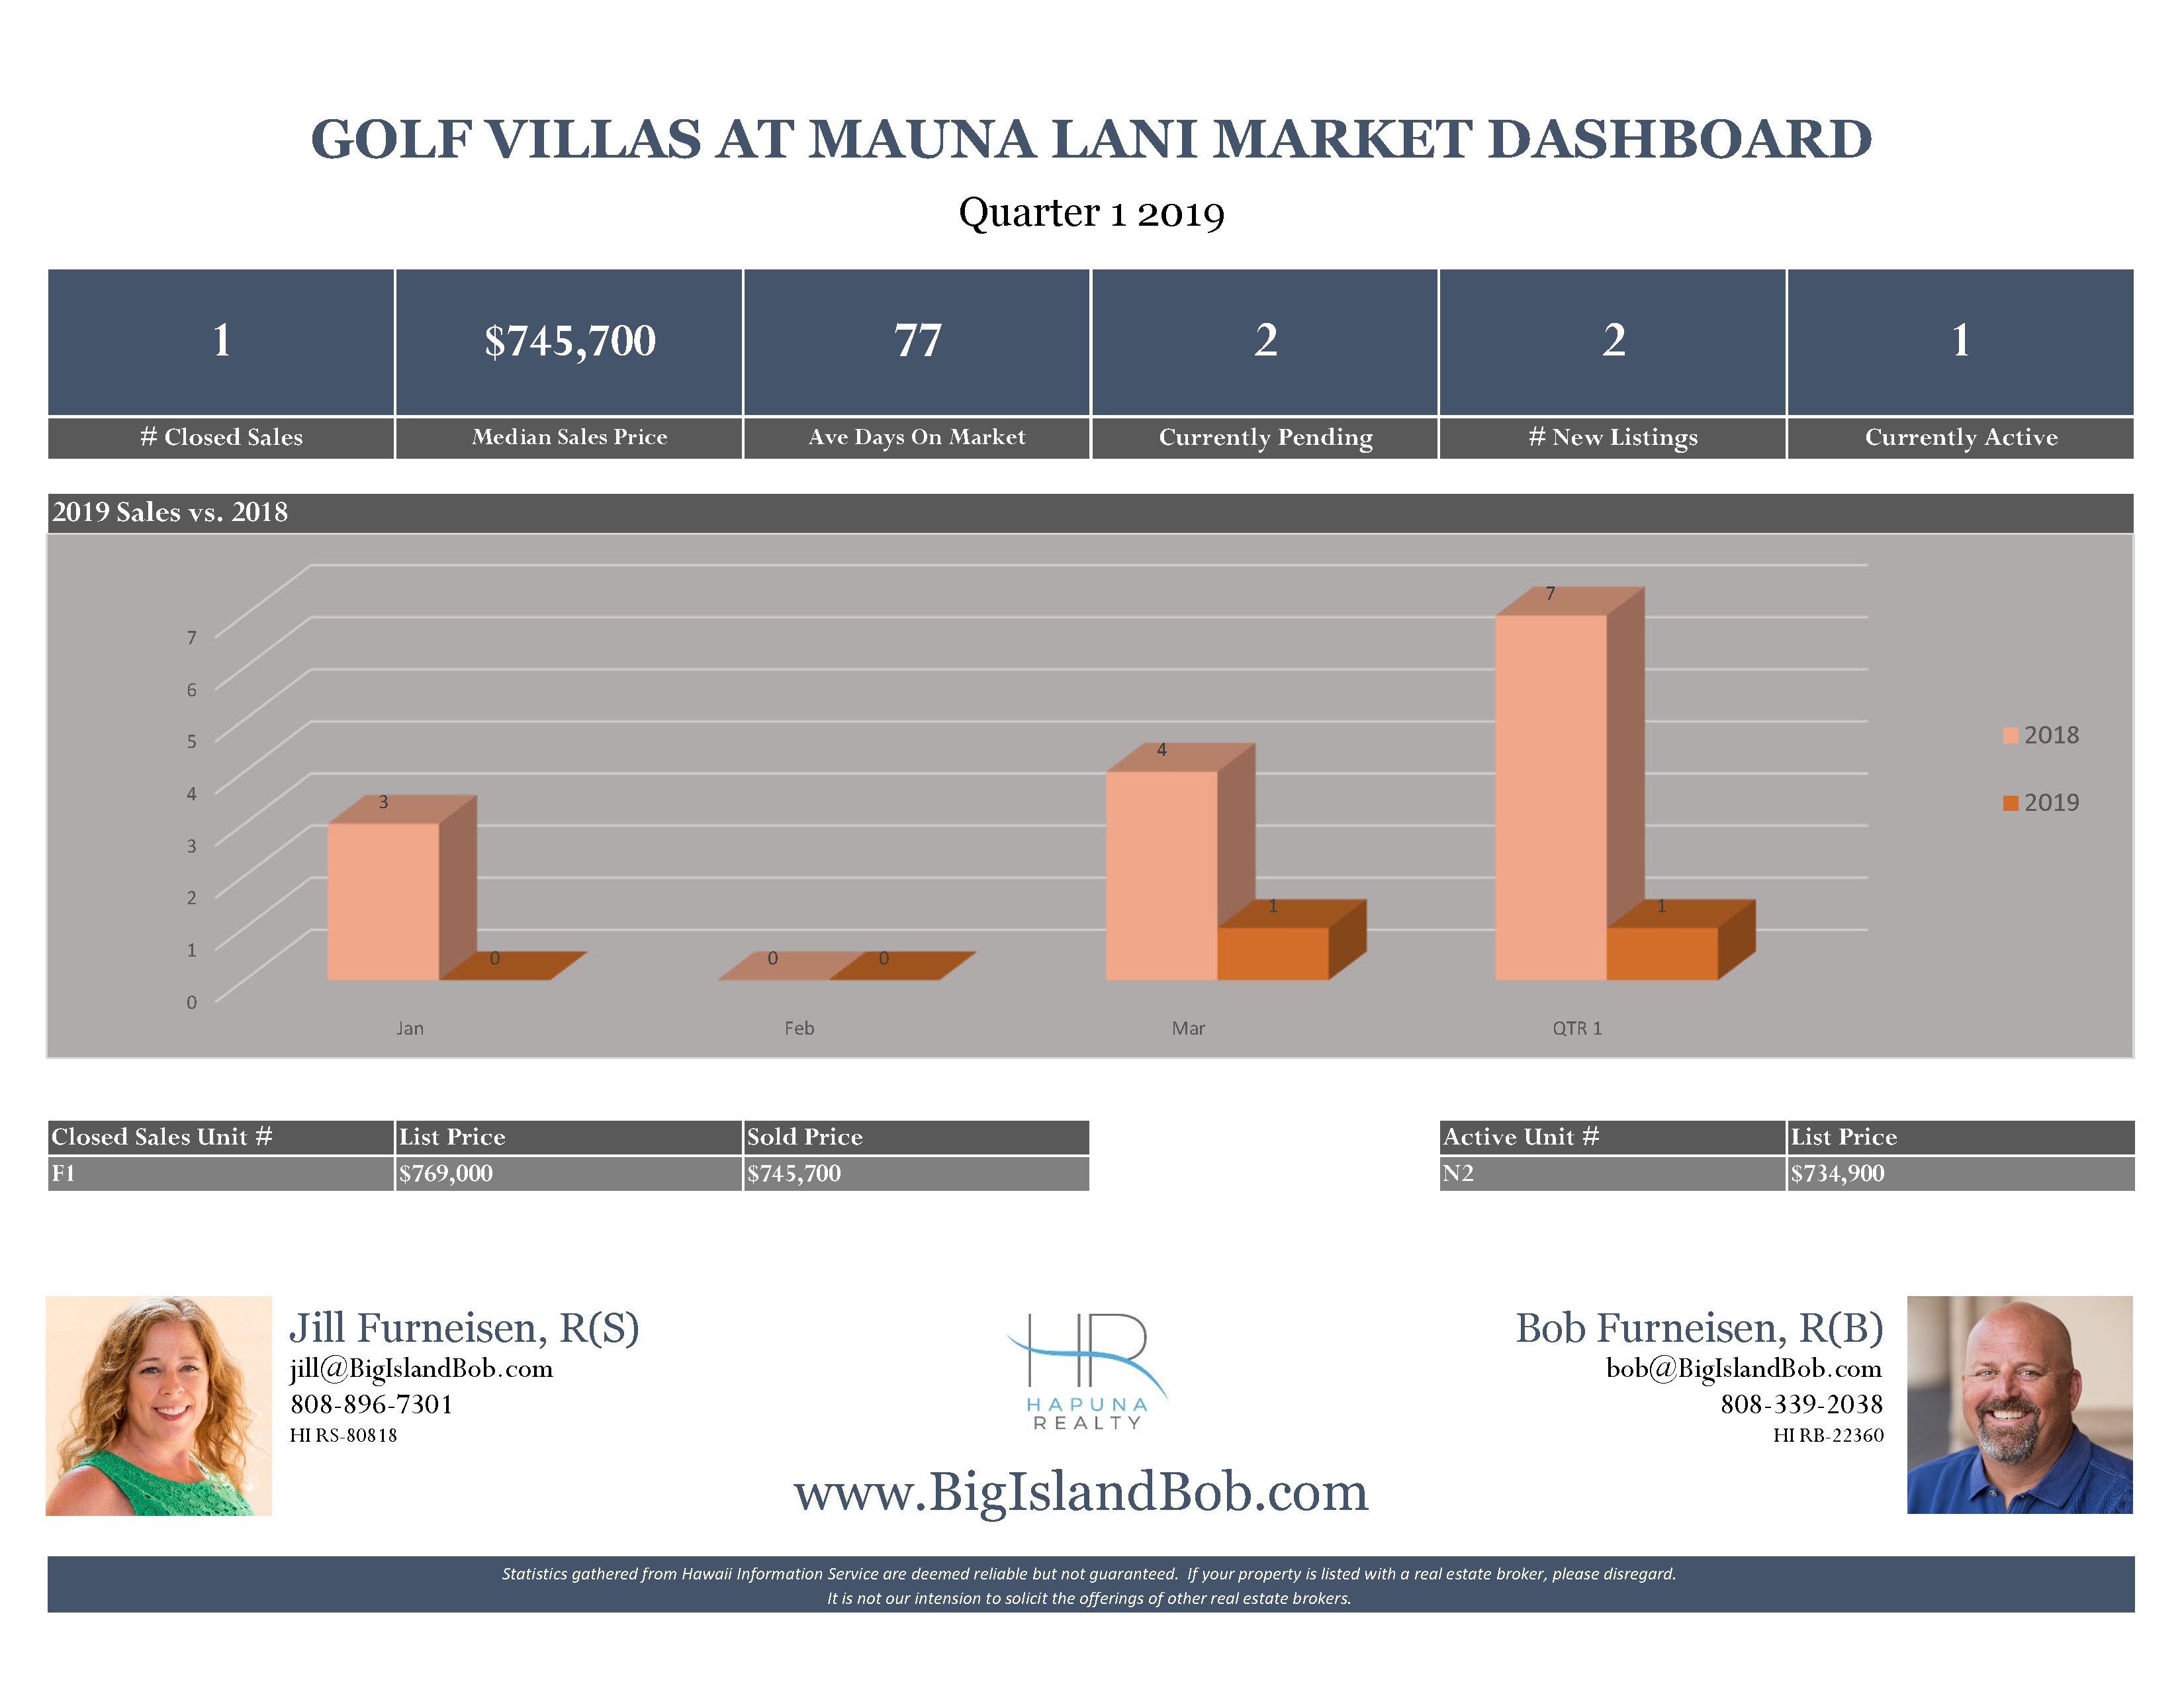 Golf Villas at Mauna Lani Quarter 1 2019 Real Estate Market Dashboard